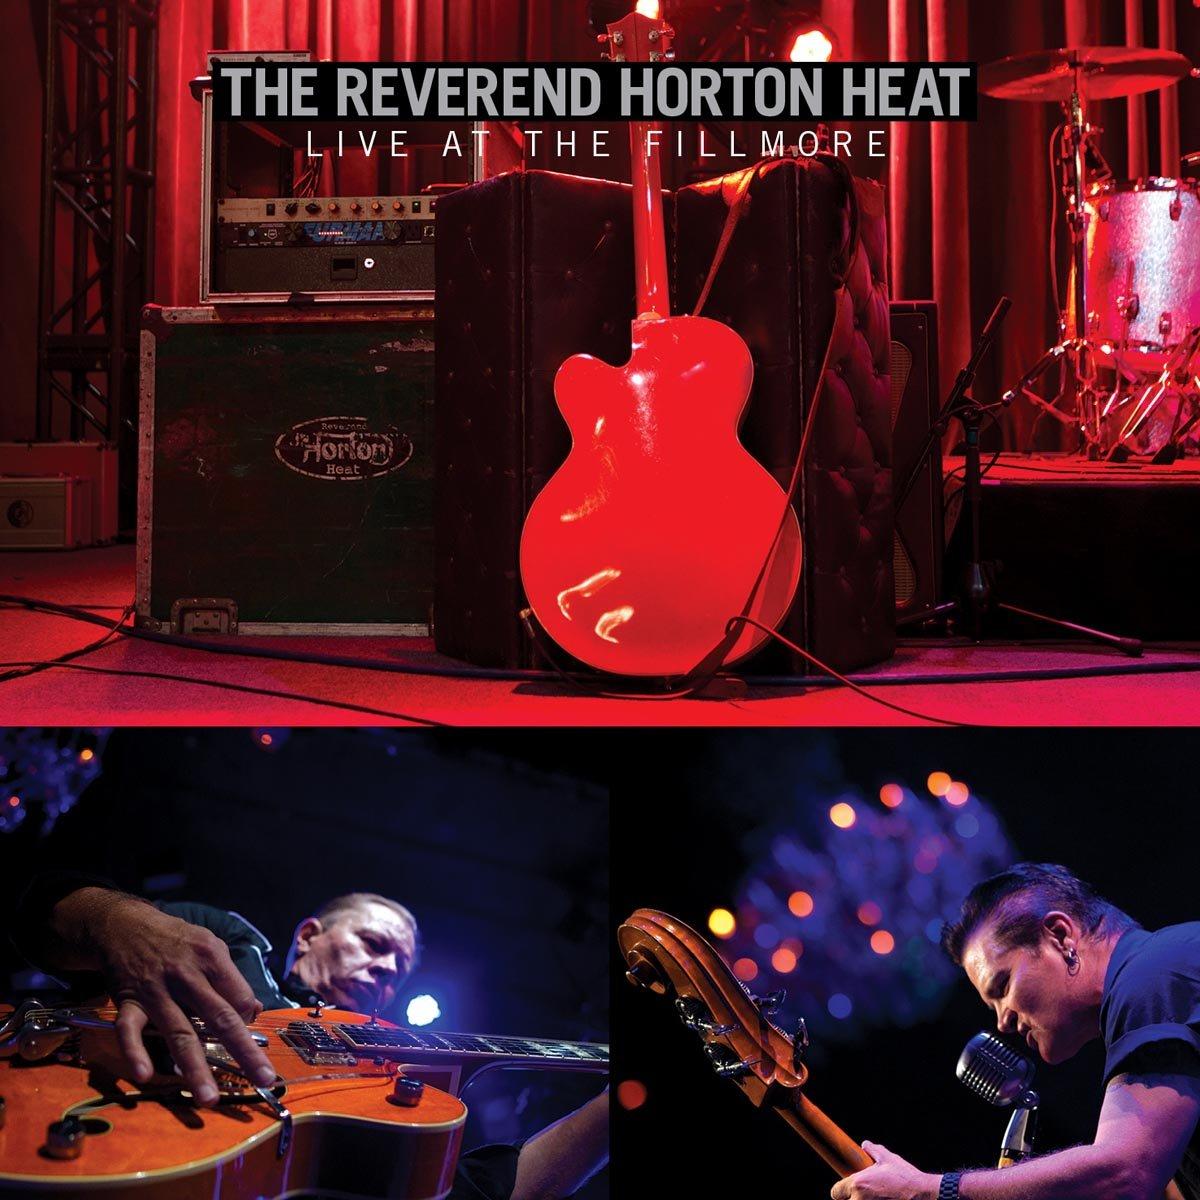 CD : The Reverend Horton Heat - Live At The Fillmore (CD)